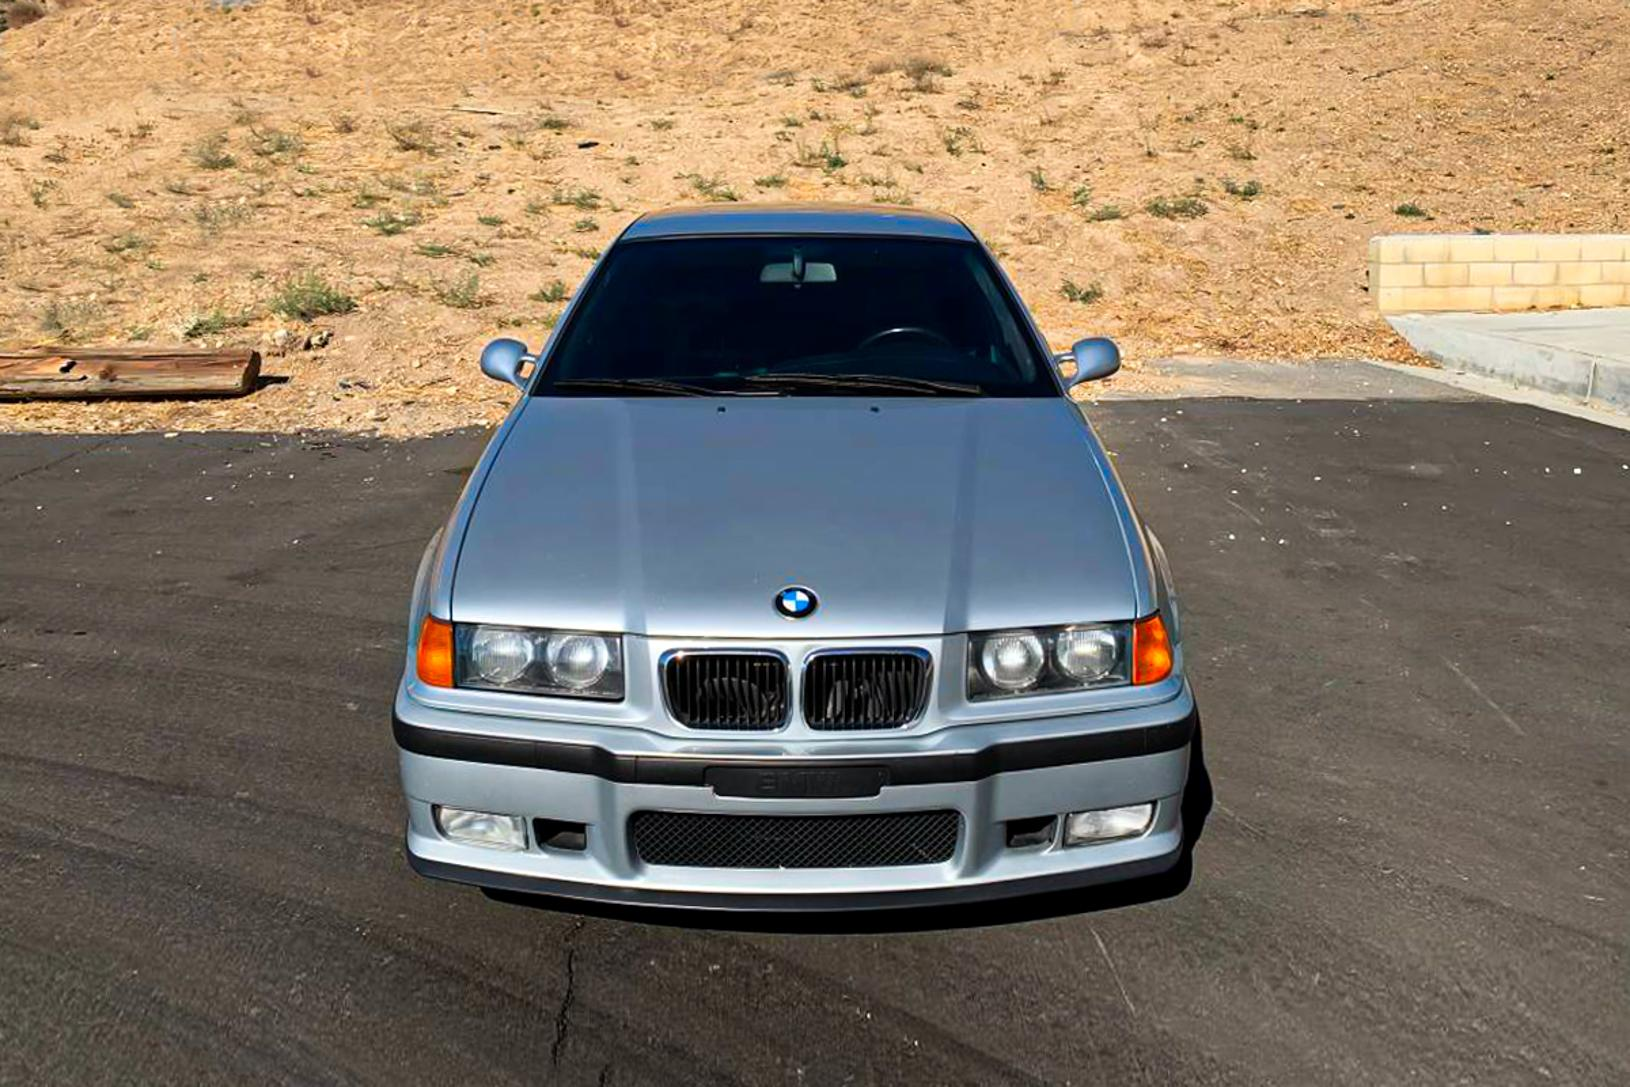 1997 BMW M3 'Slicktop'